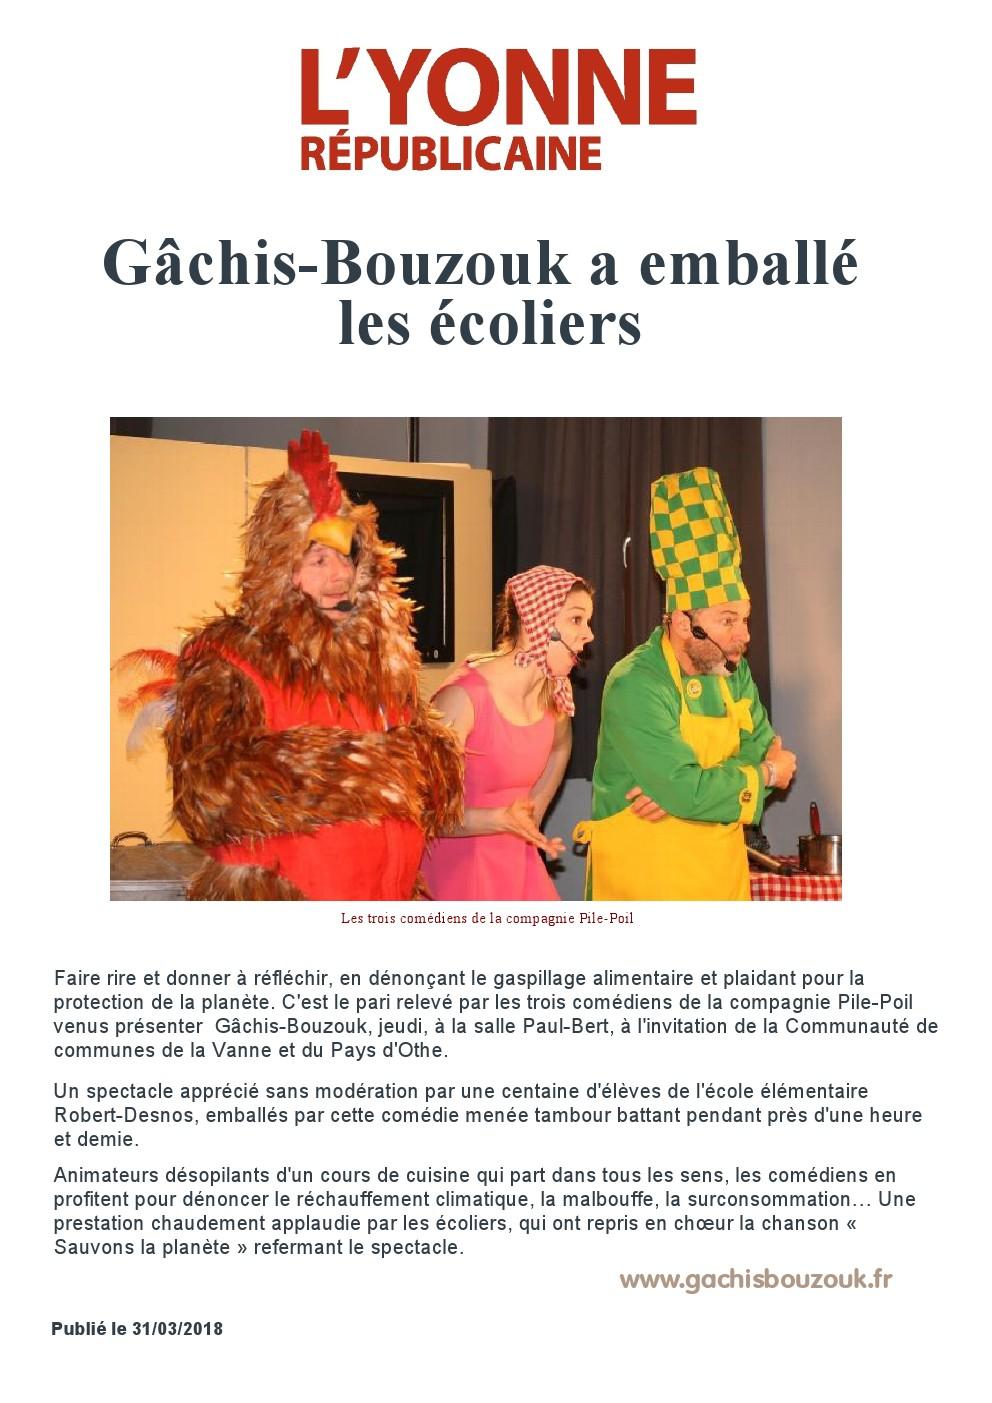 ARTICLE YONNE REPUBLICAINE GACHIS